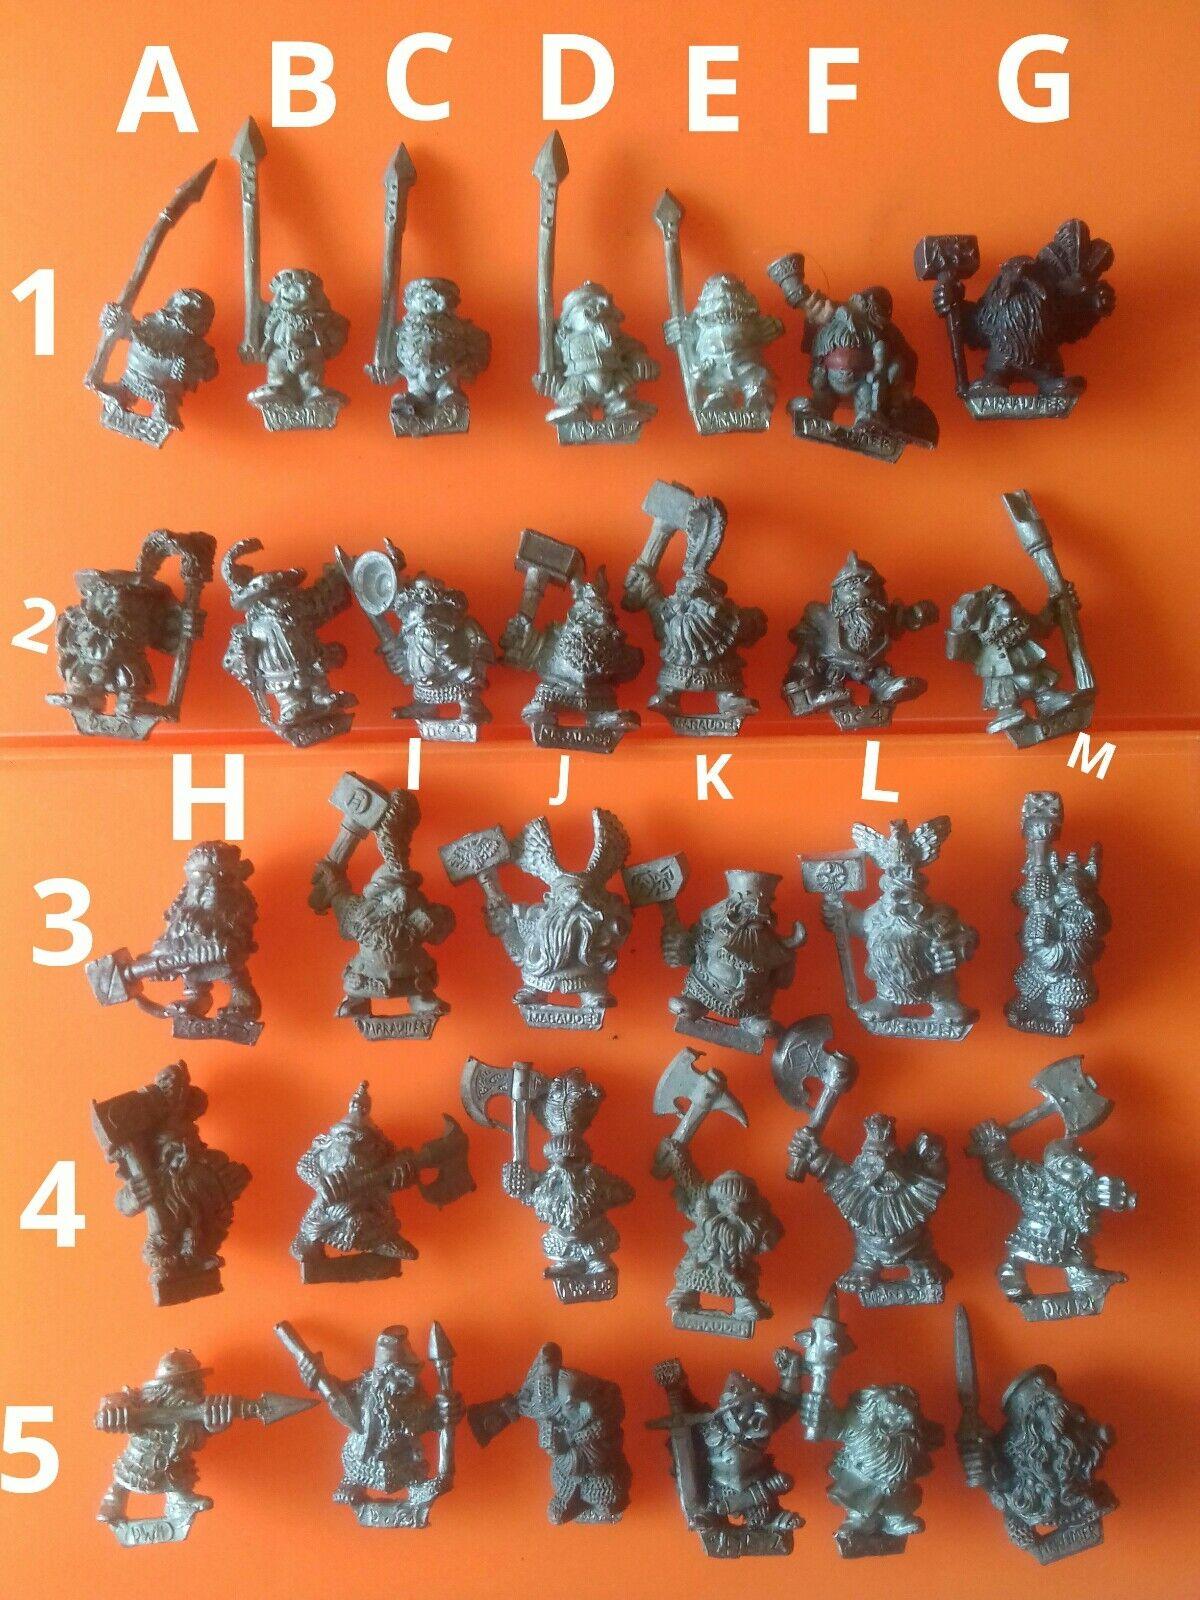 32x MM various dwarf warrior marauder miniatures via citadel gw dwarfs dwarves